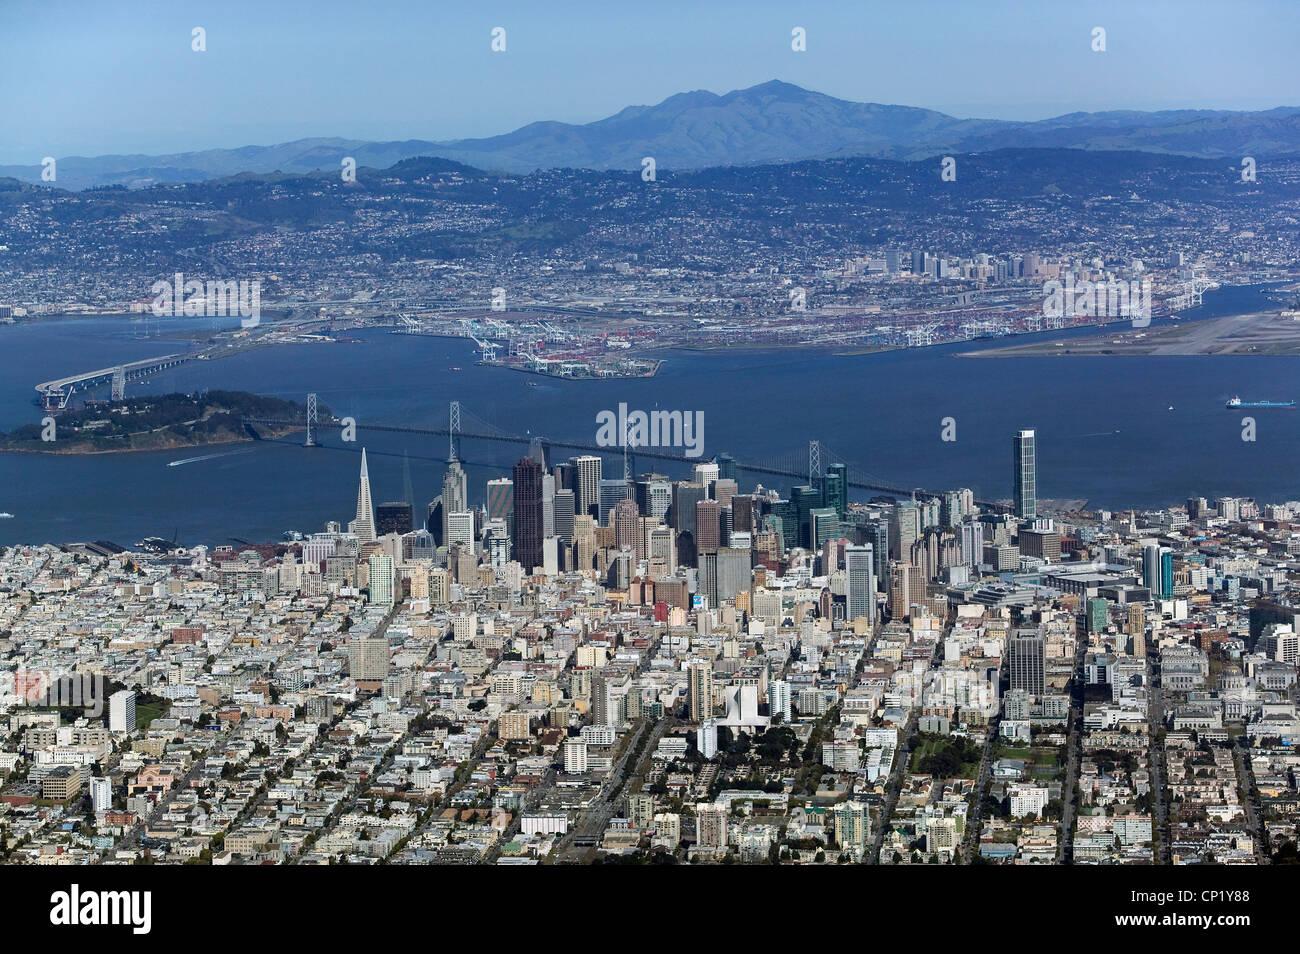 aerial photograph overview skyline San Francisco California toward Oakland and Mount Diablo - Stock Image